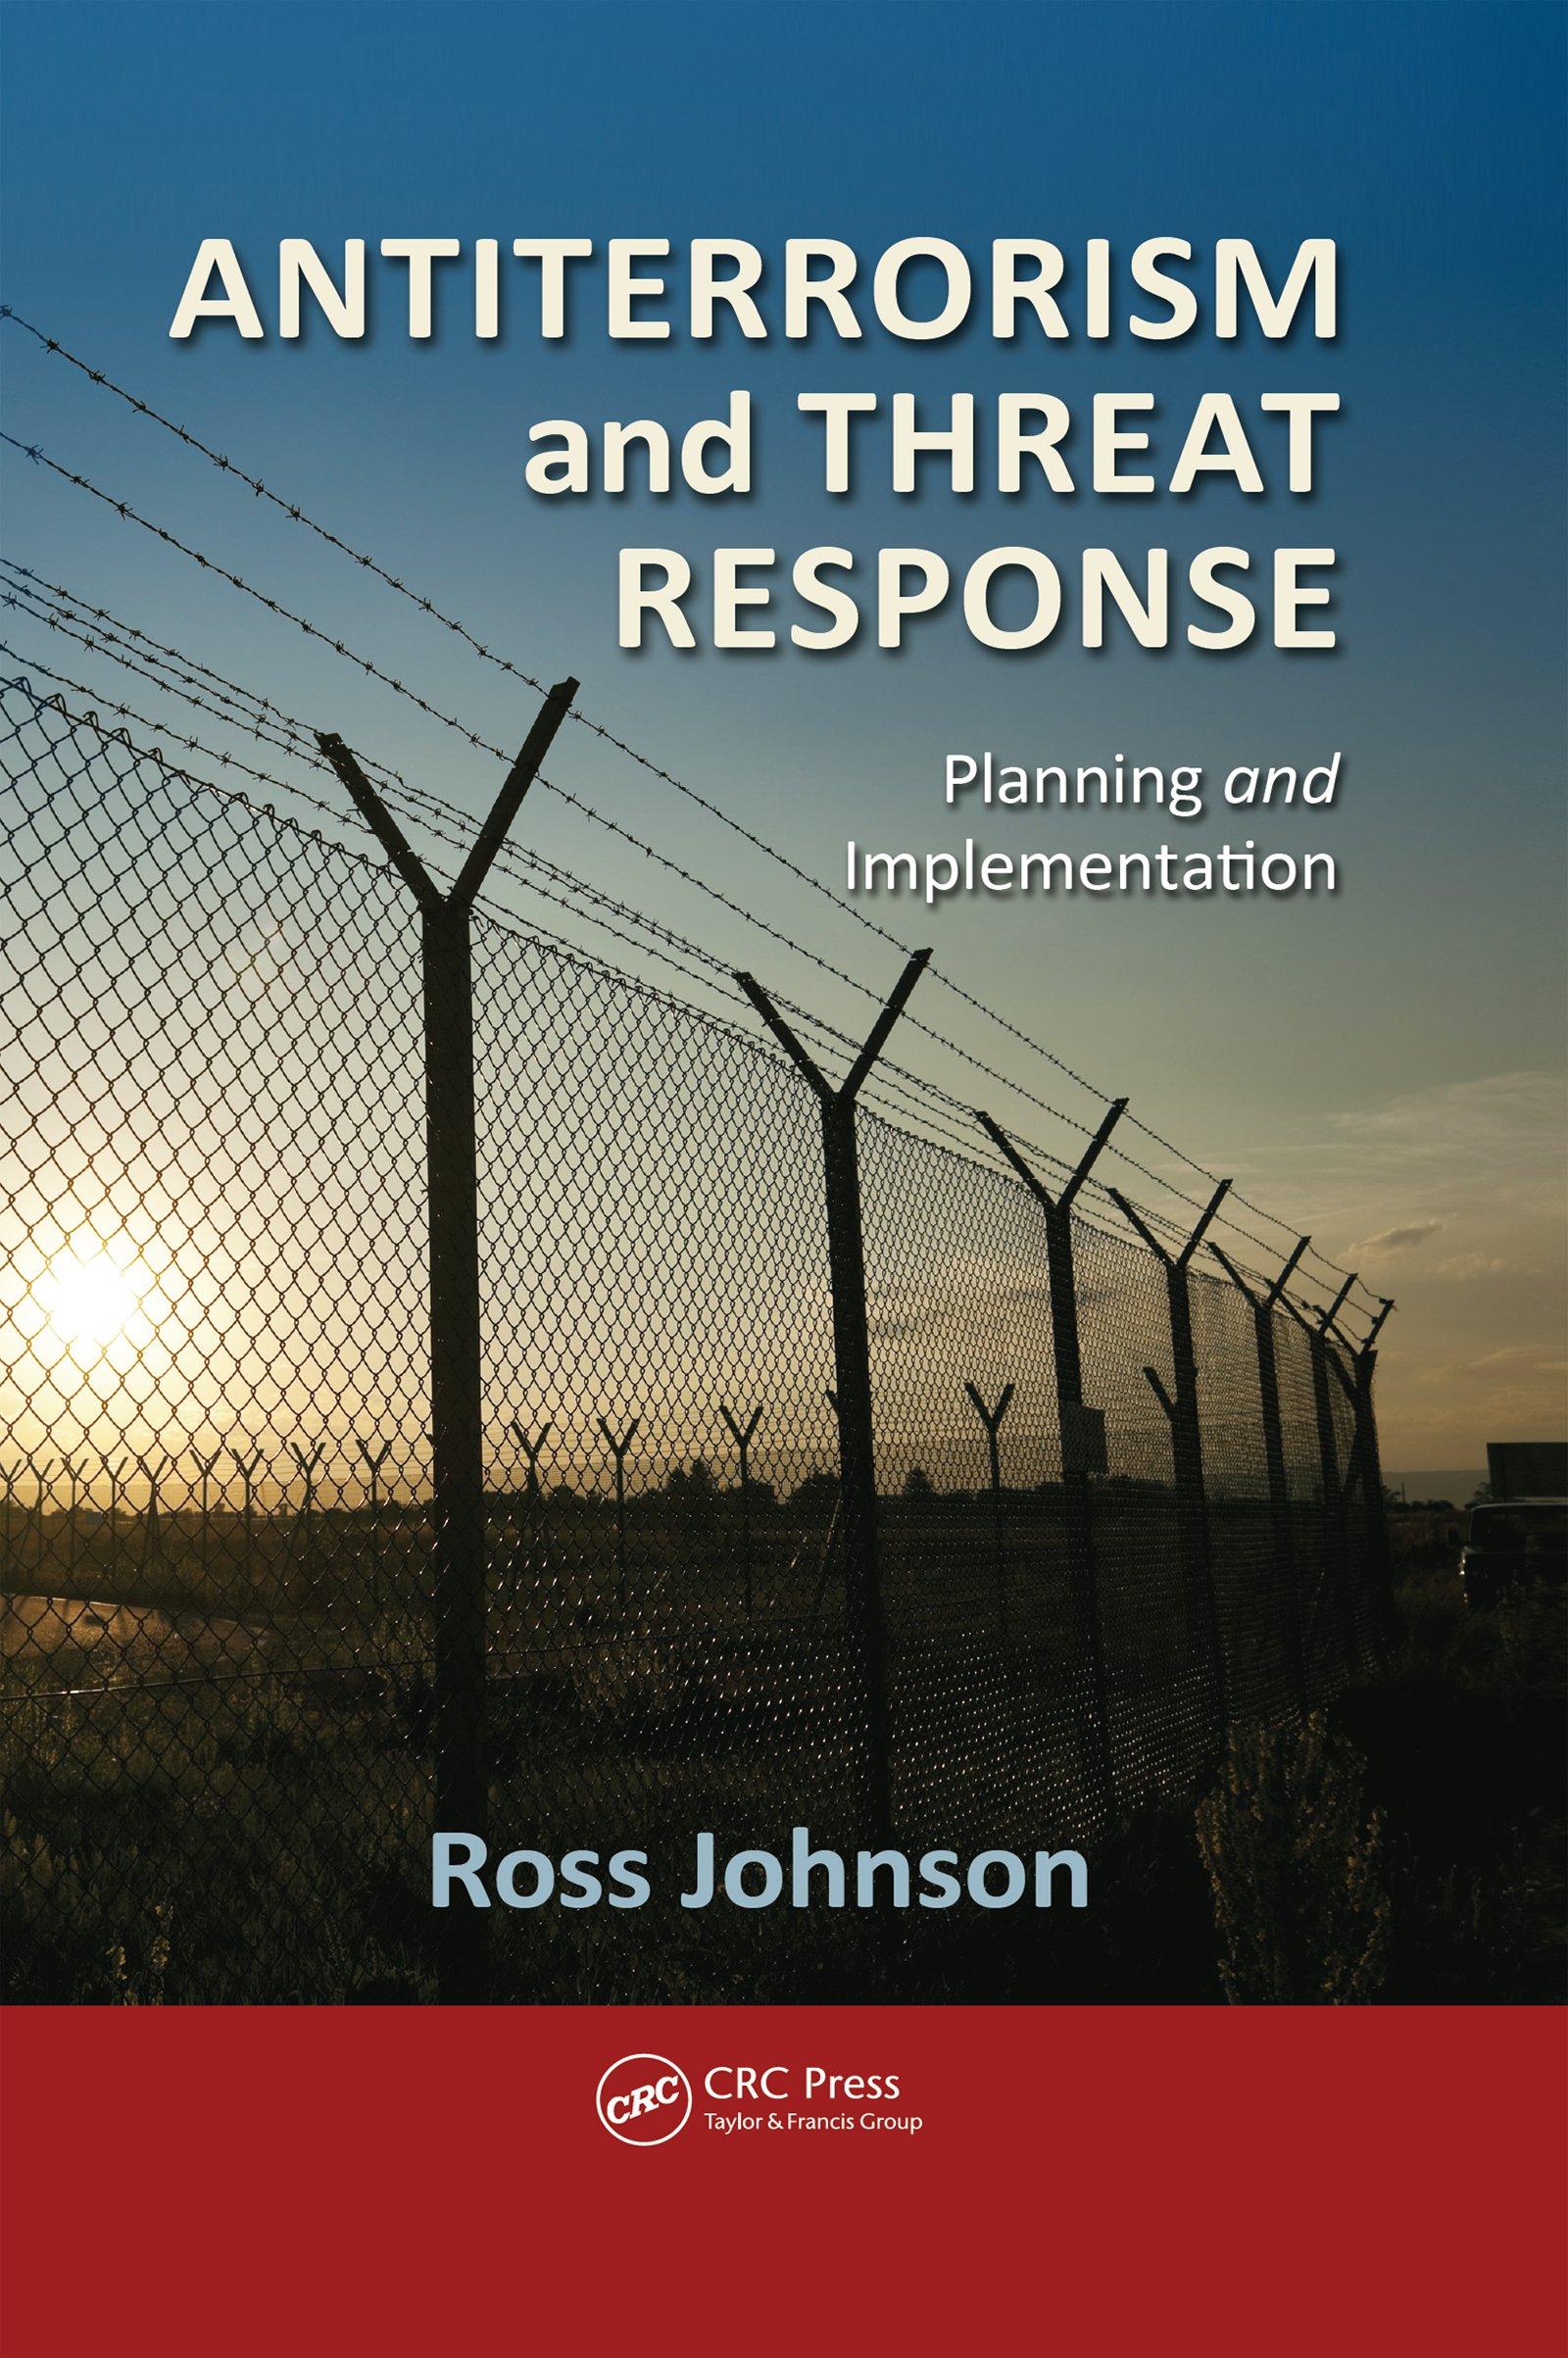 Response Planning